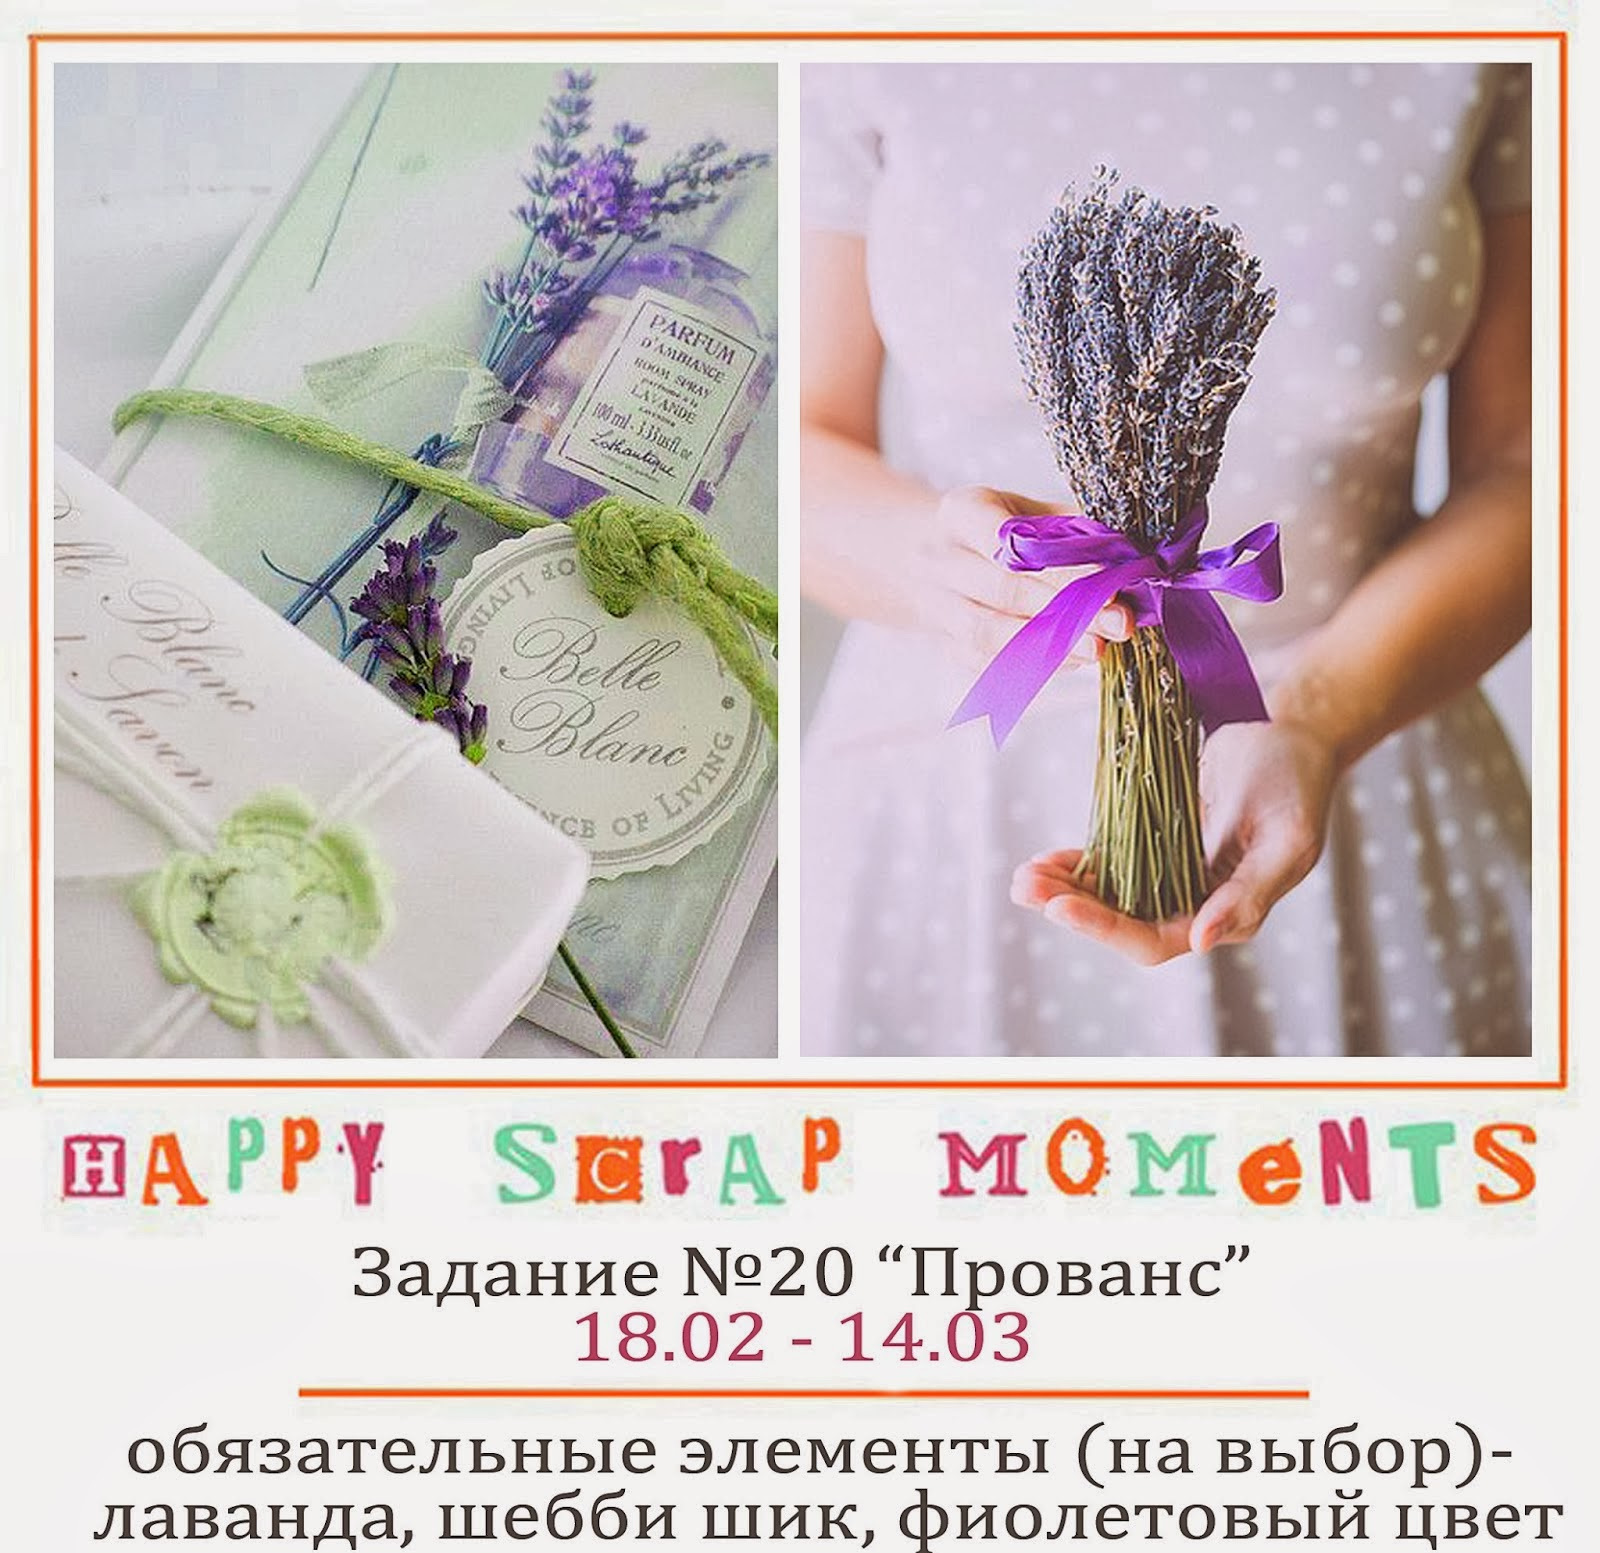 http://happyscrapmoments.blogspot.ru/2014/02/20_17.html